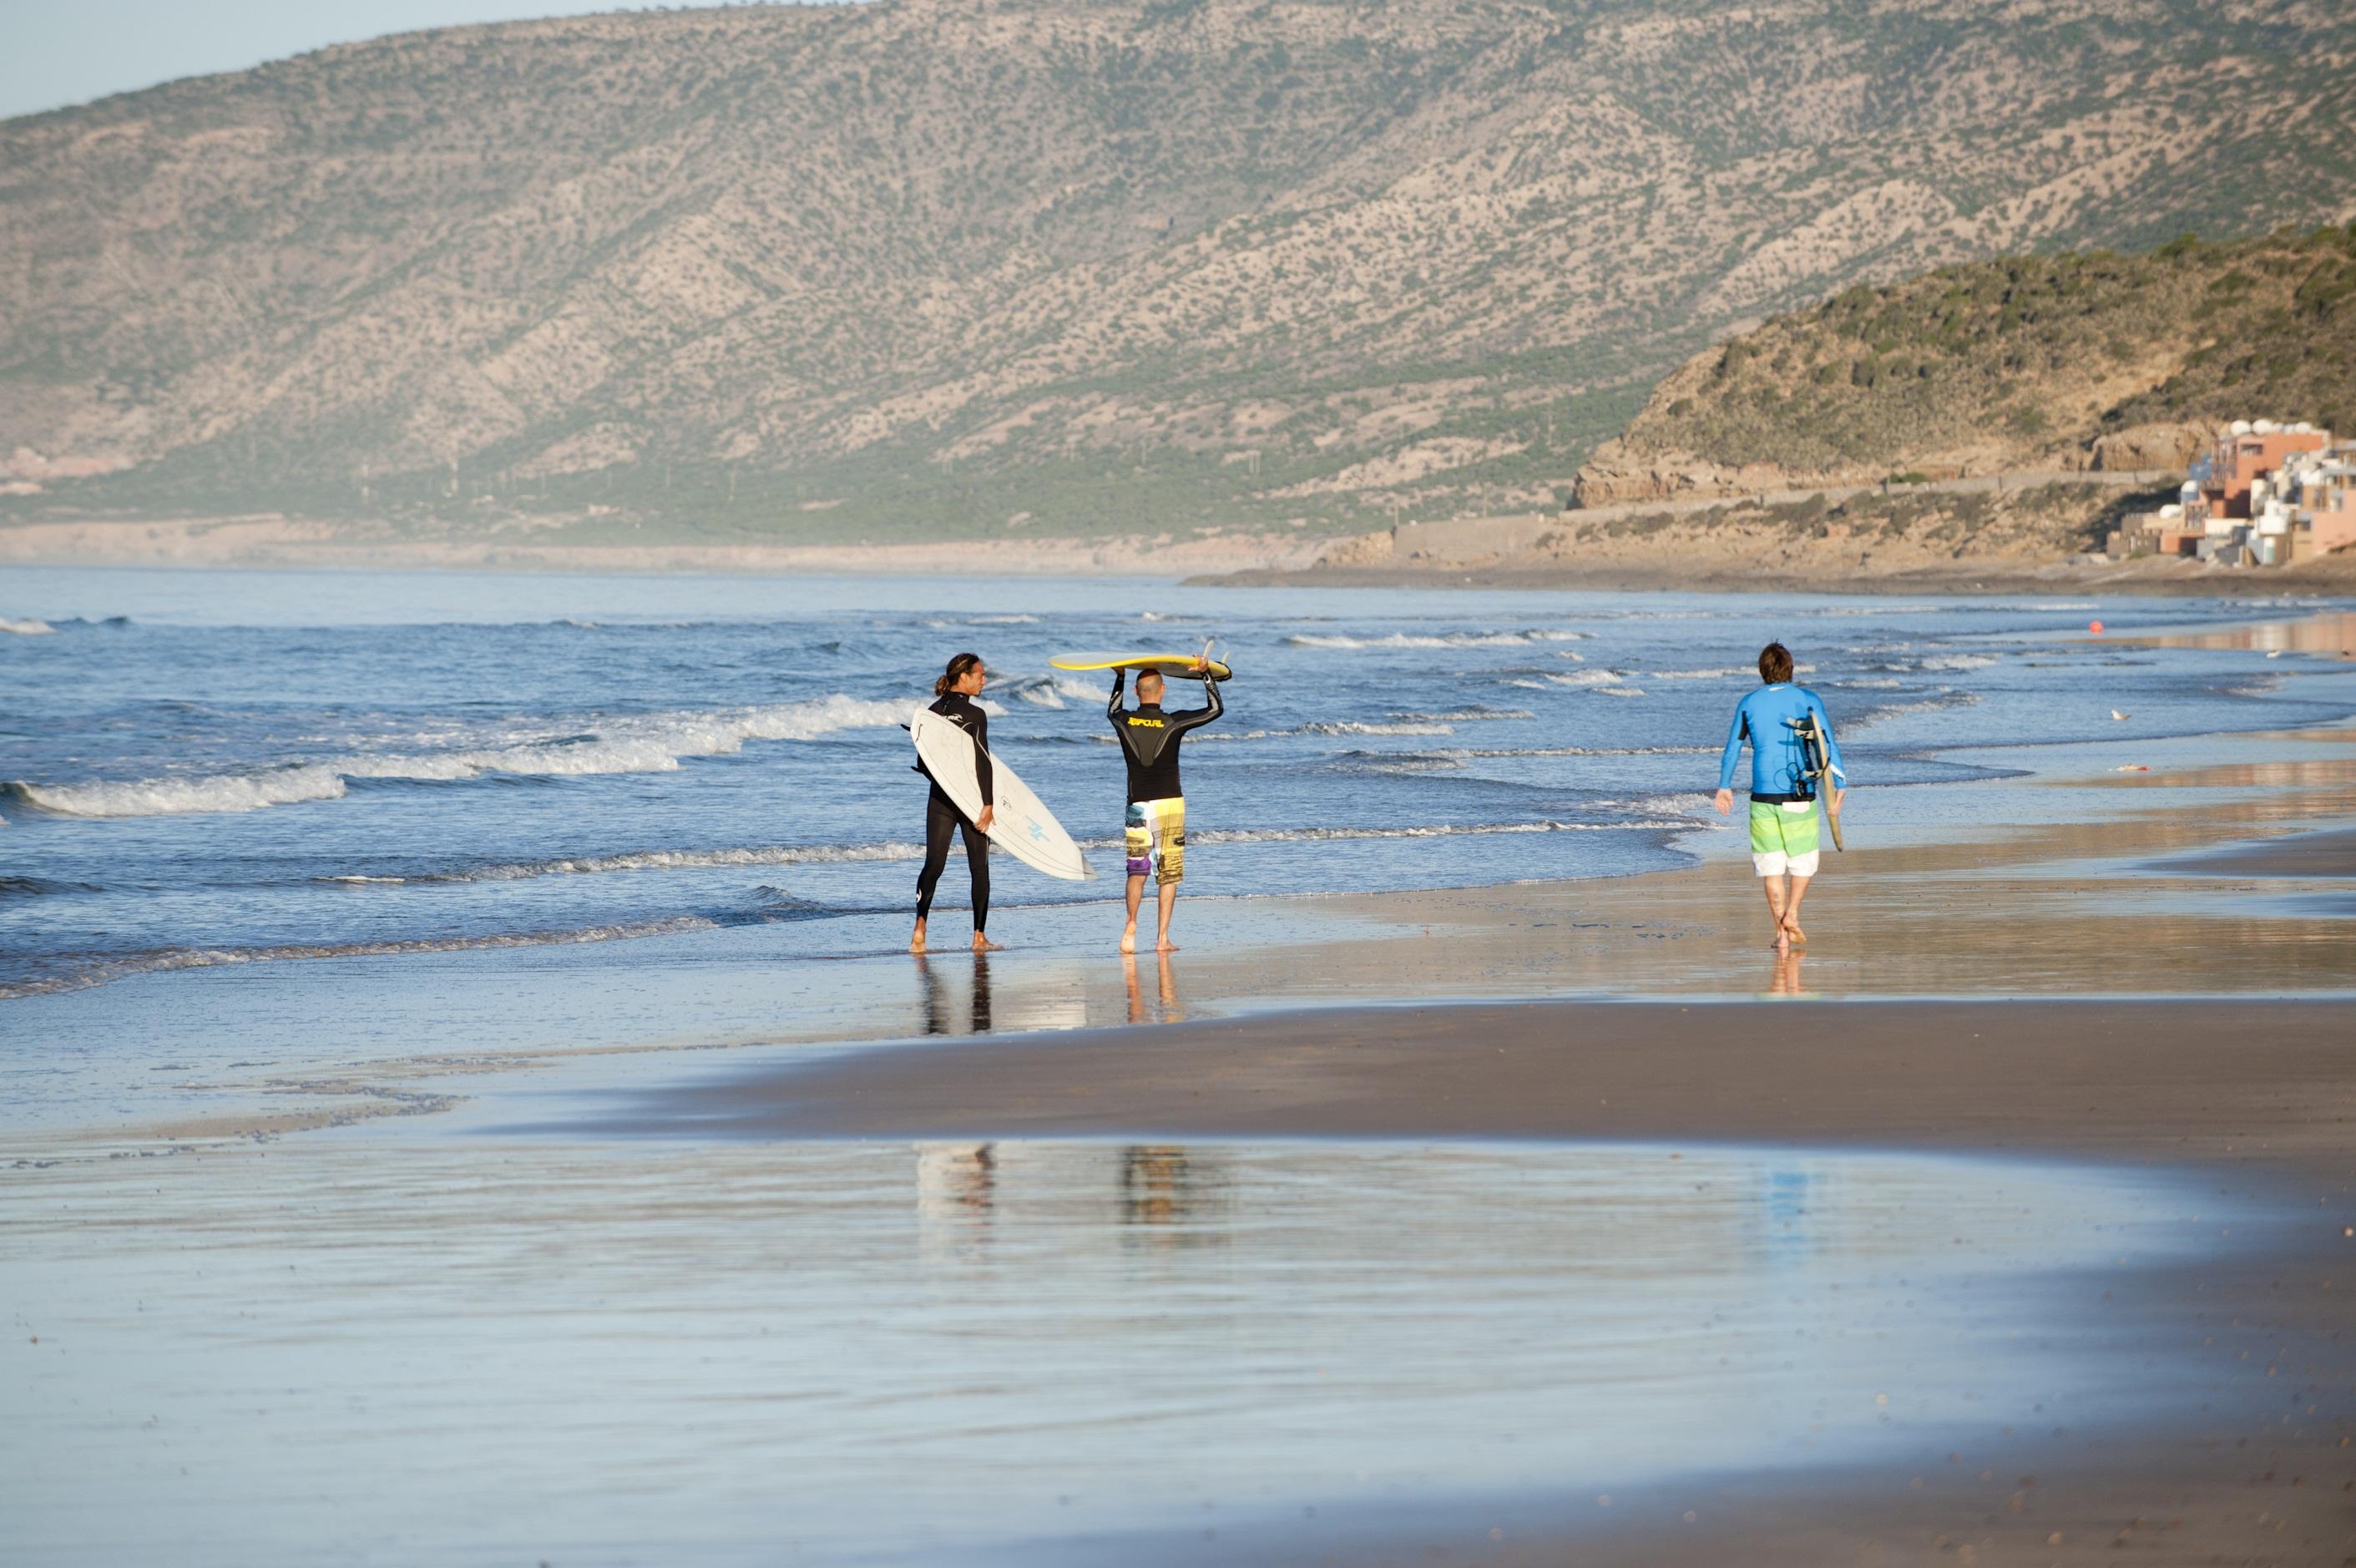 paradis-plage-surf-holiday-morocco